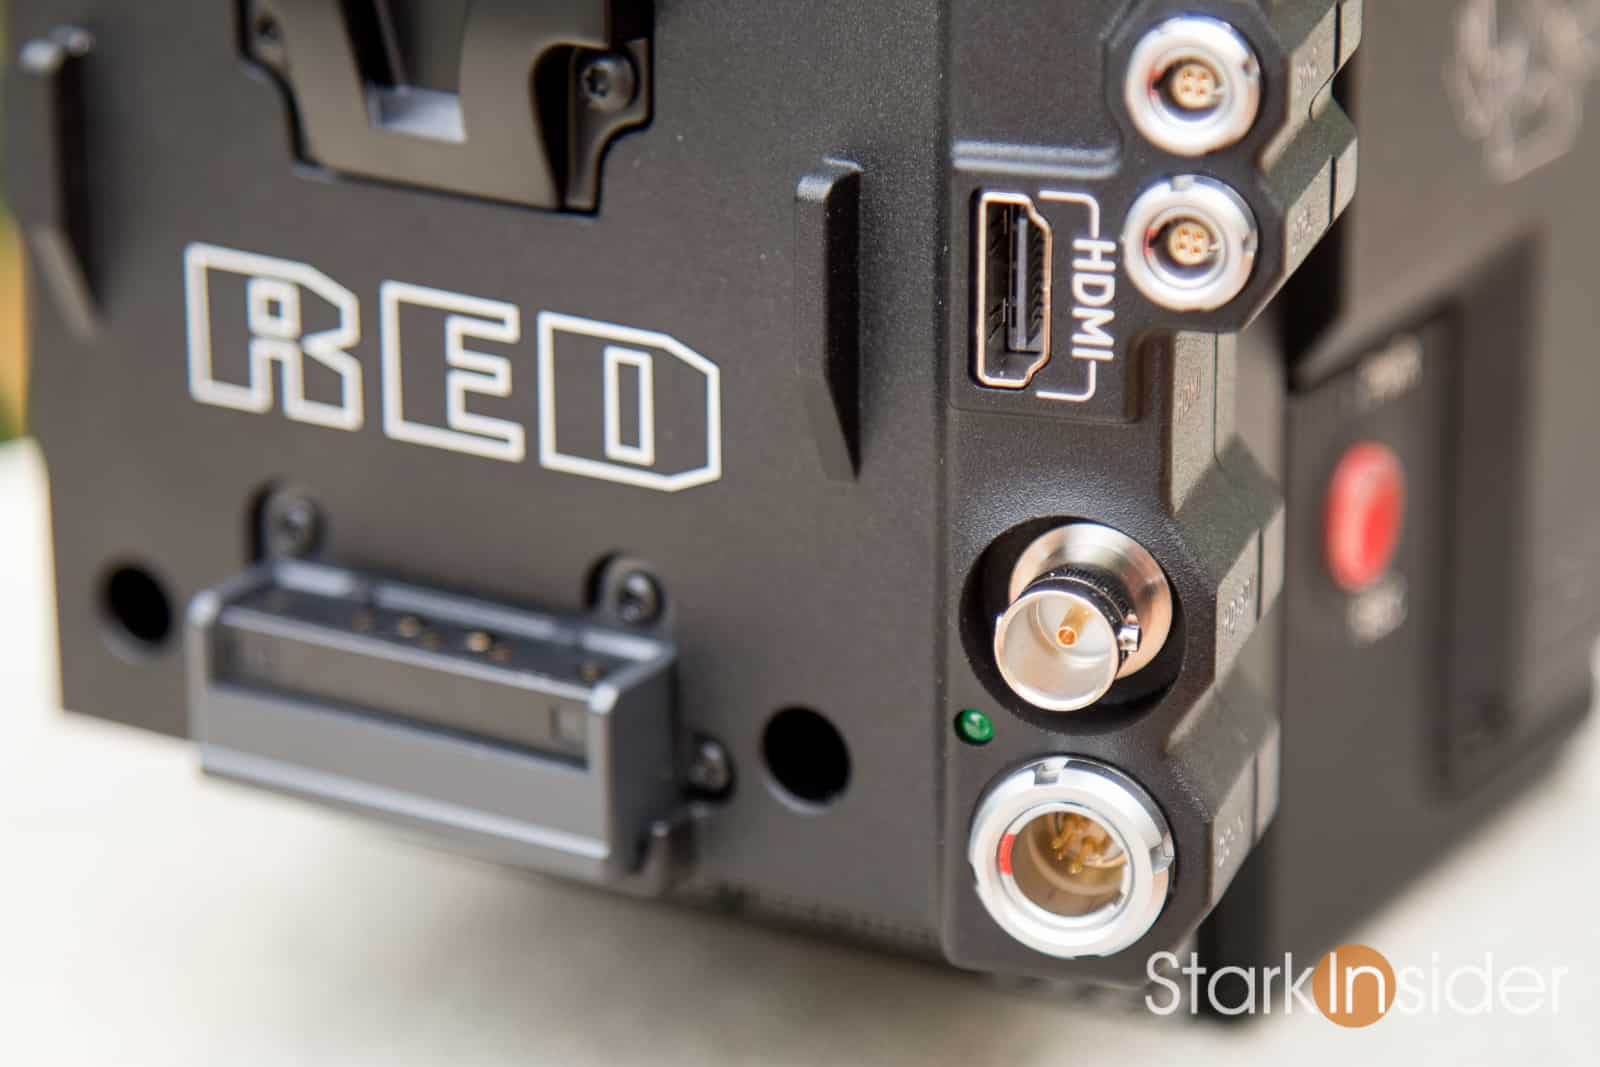 RED-Raven-Camera-Unboxing-Stark-Insider-8732